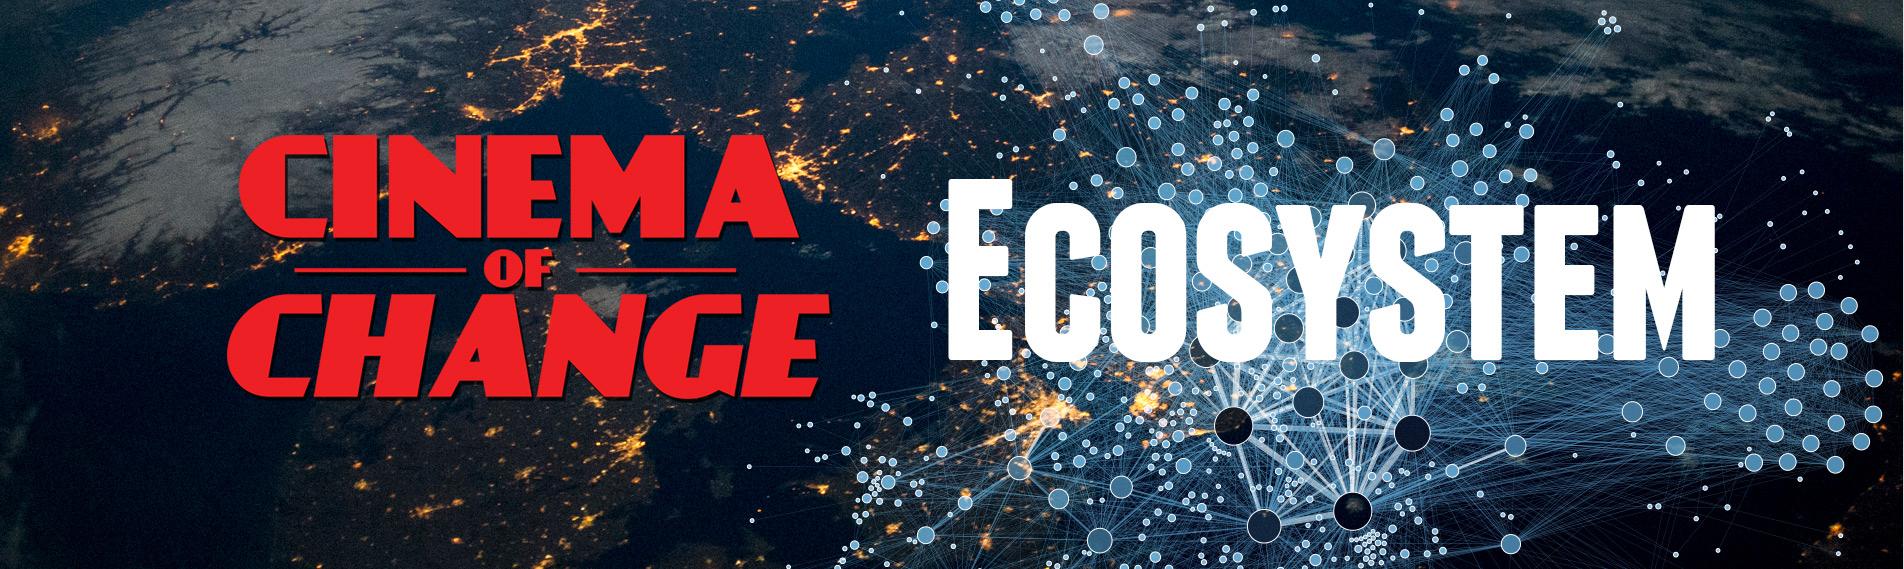 cinema-of-change-ecosystem-logo